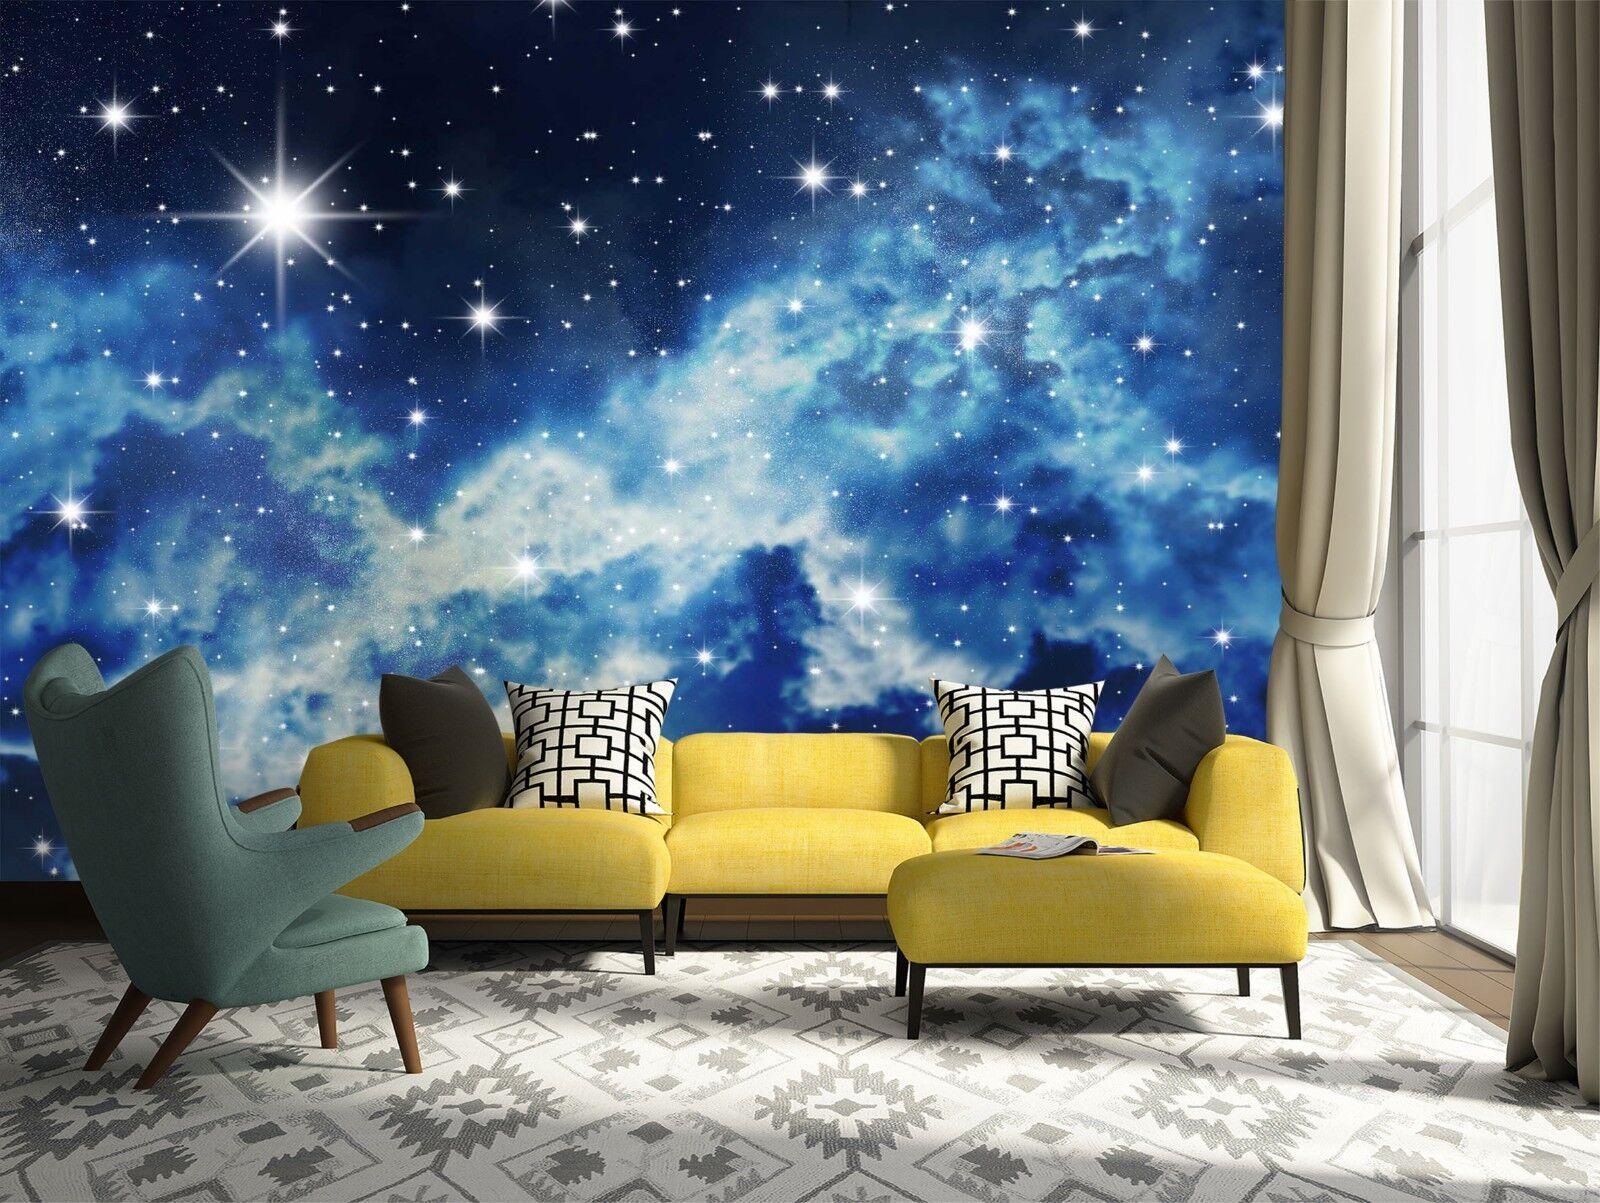 3D Starry Sk Night 78 Wallpaper Mural Wall Print Wall Wallpaper Murals US Lemon